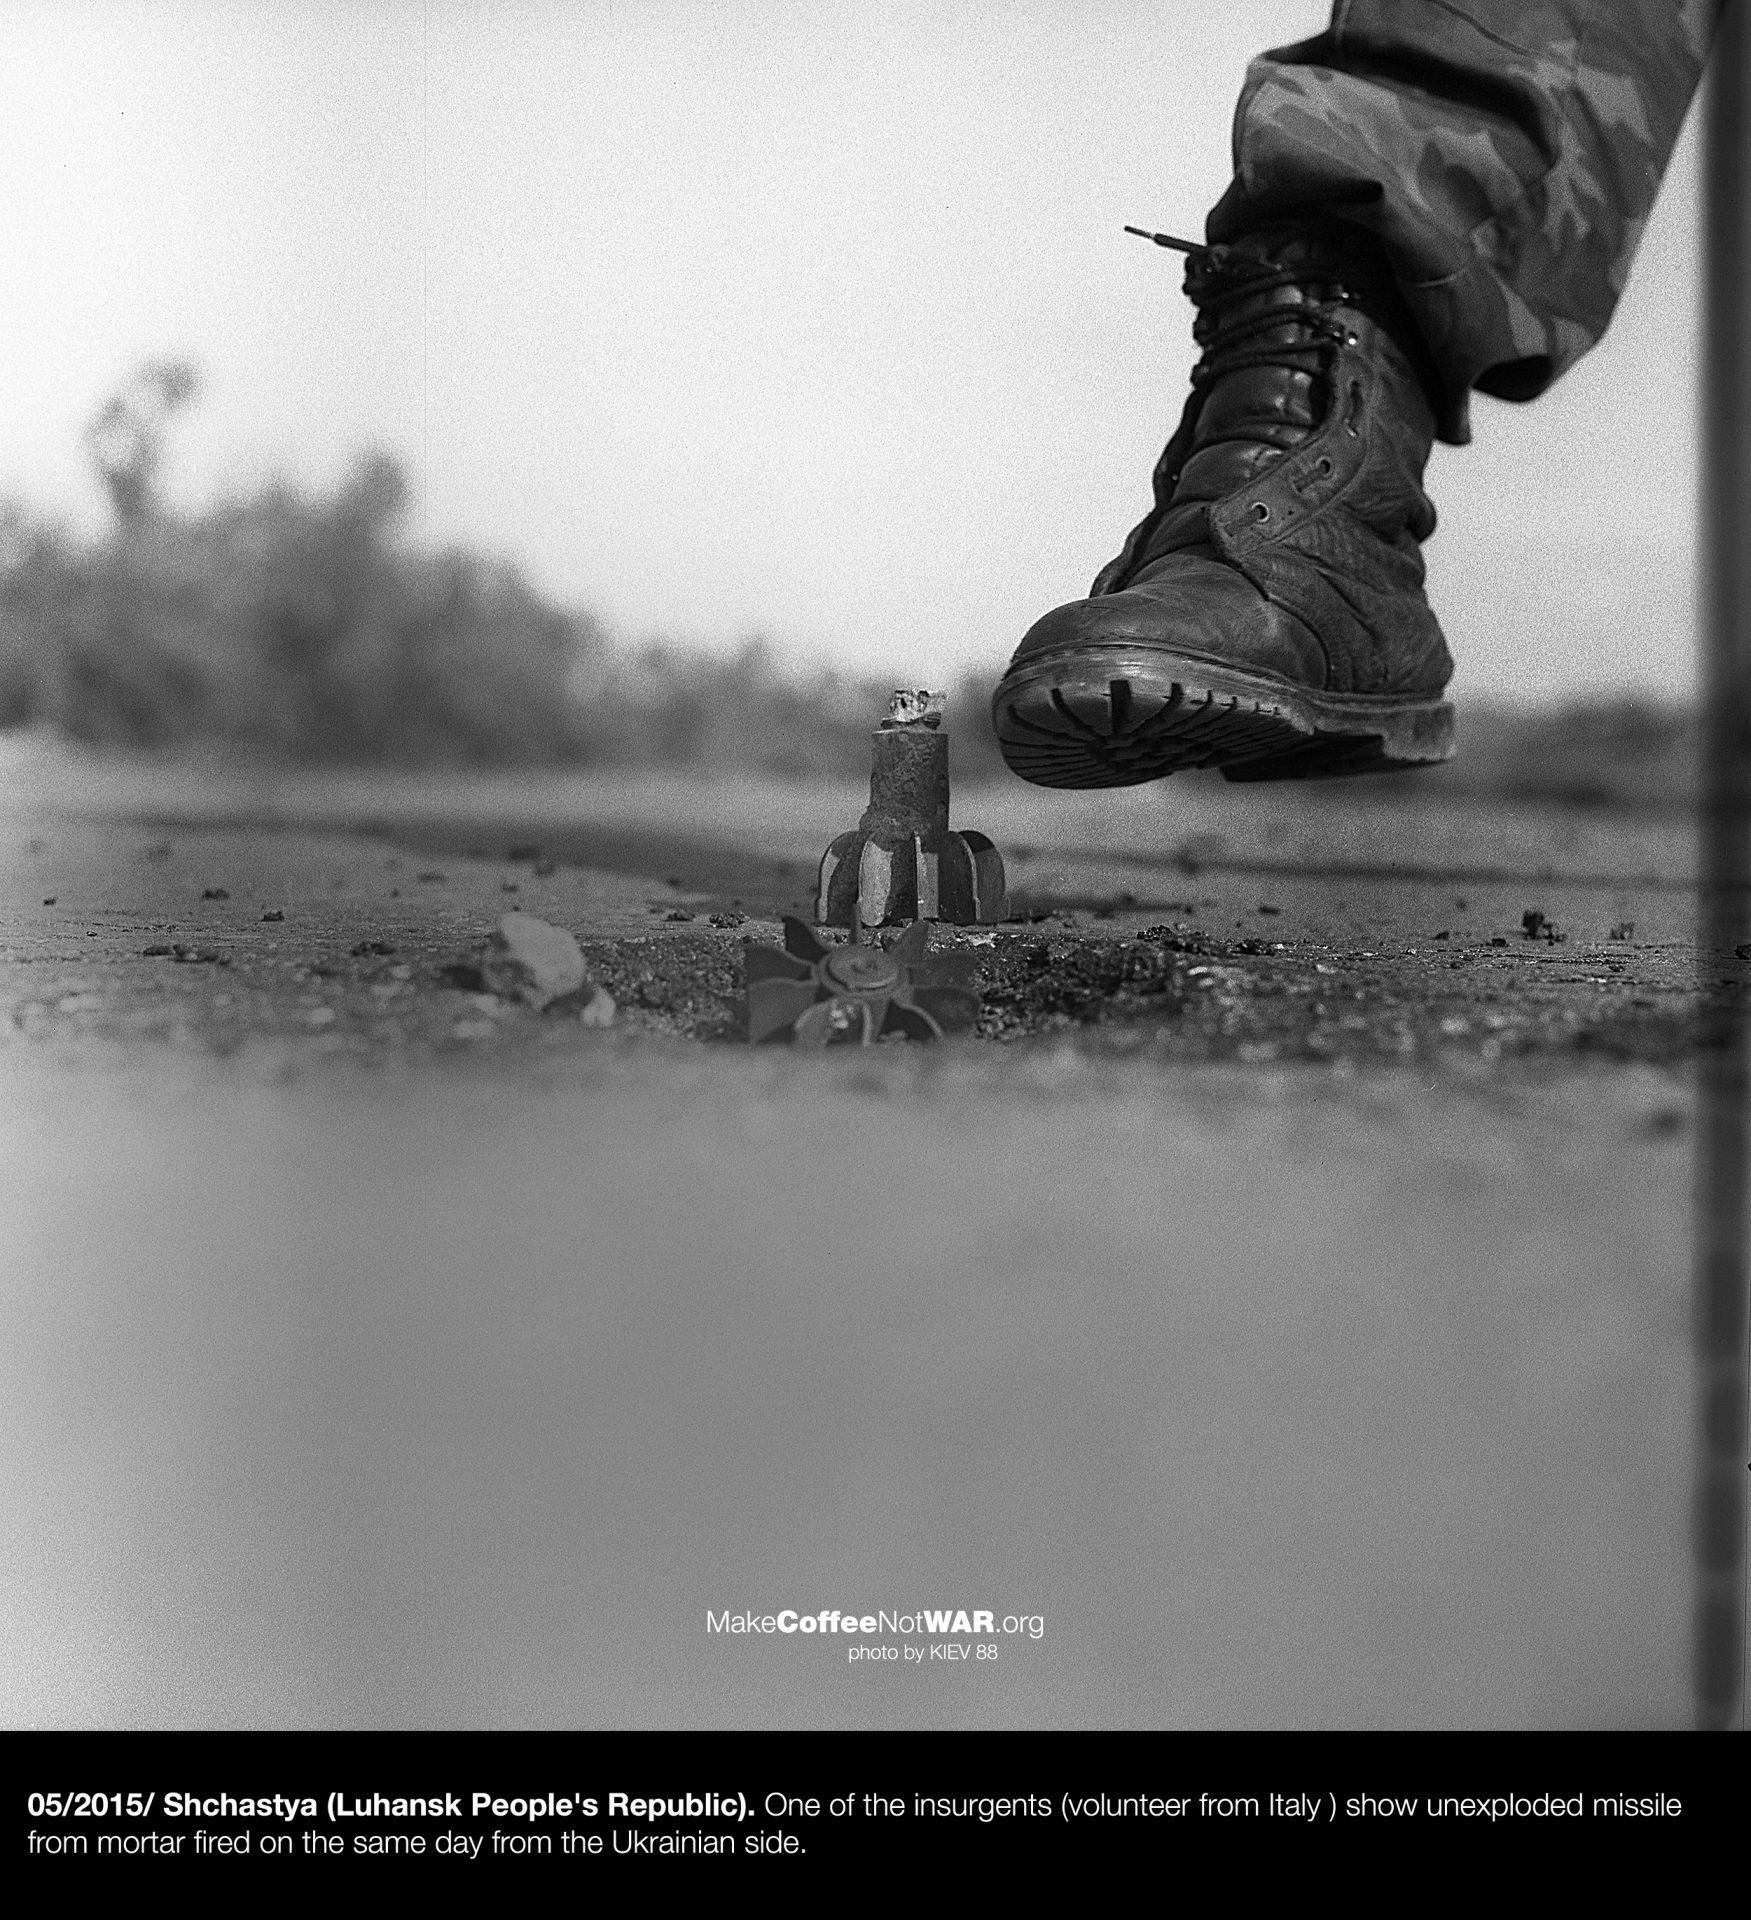 A little bit of photography from Ukrainian war by analog KIEV 88.